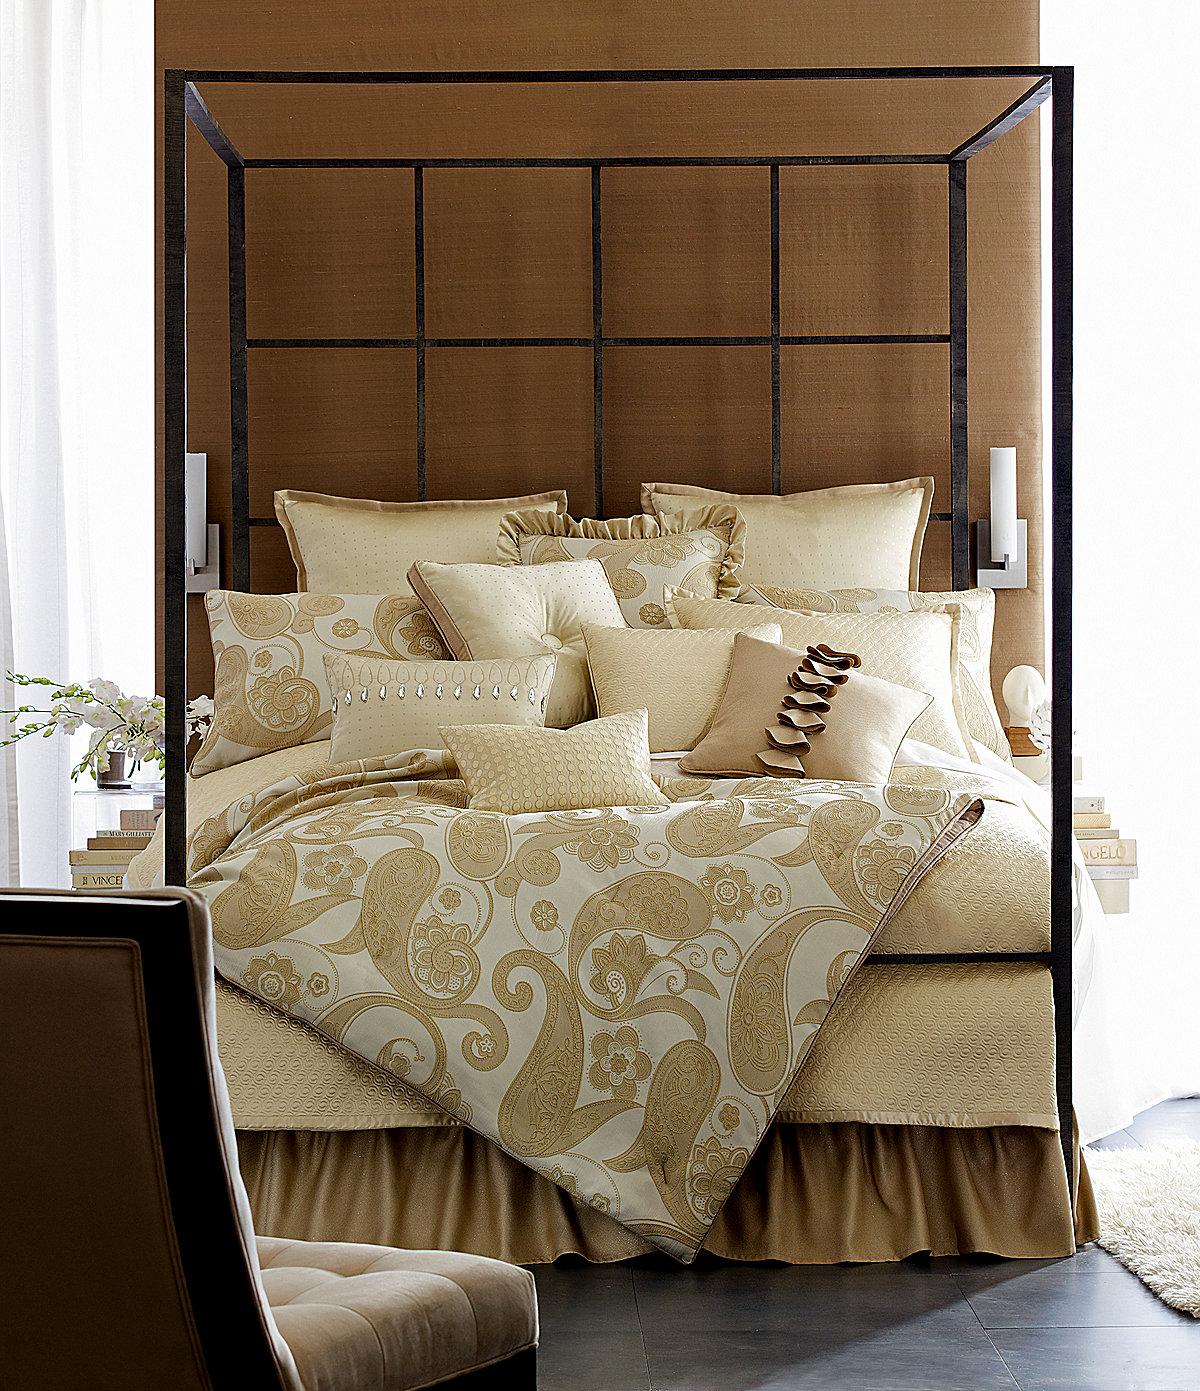 candice olson bedroom dillards photo - 2